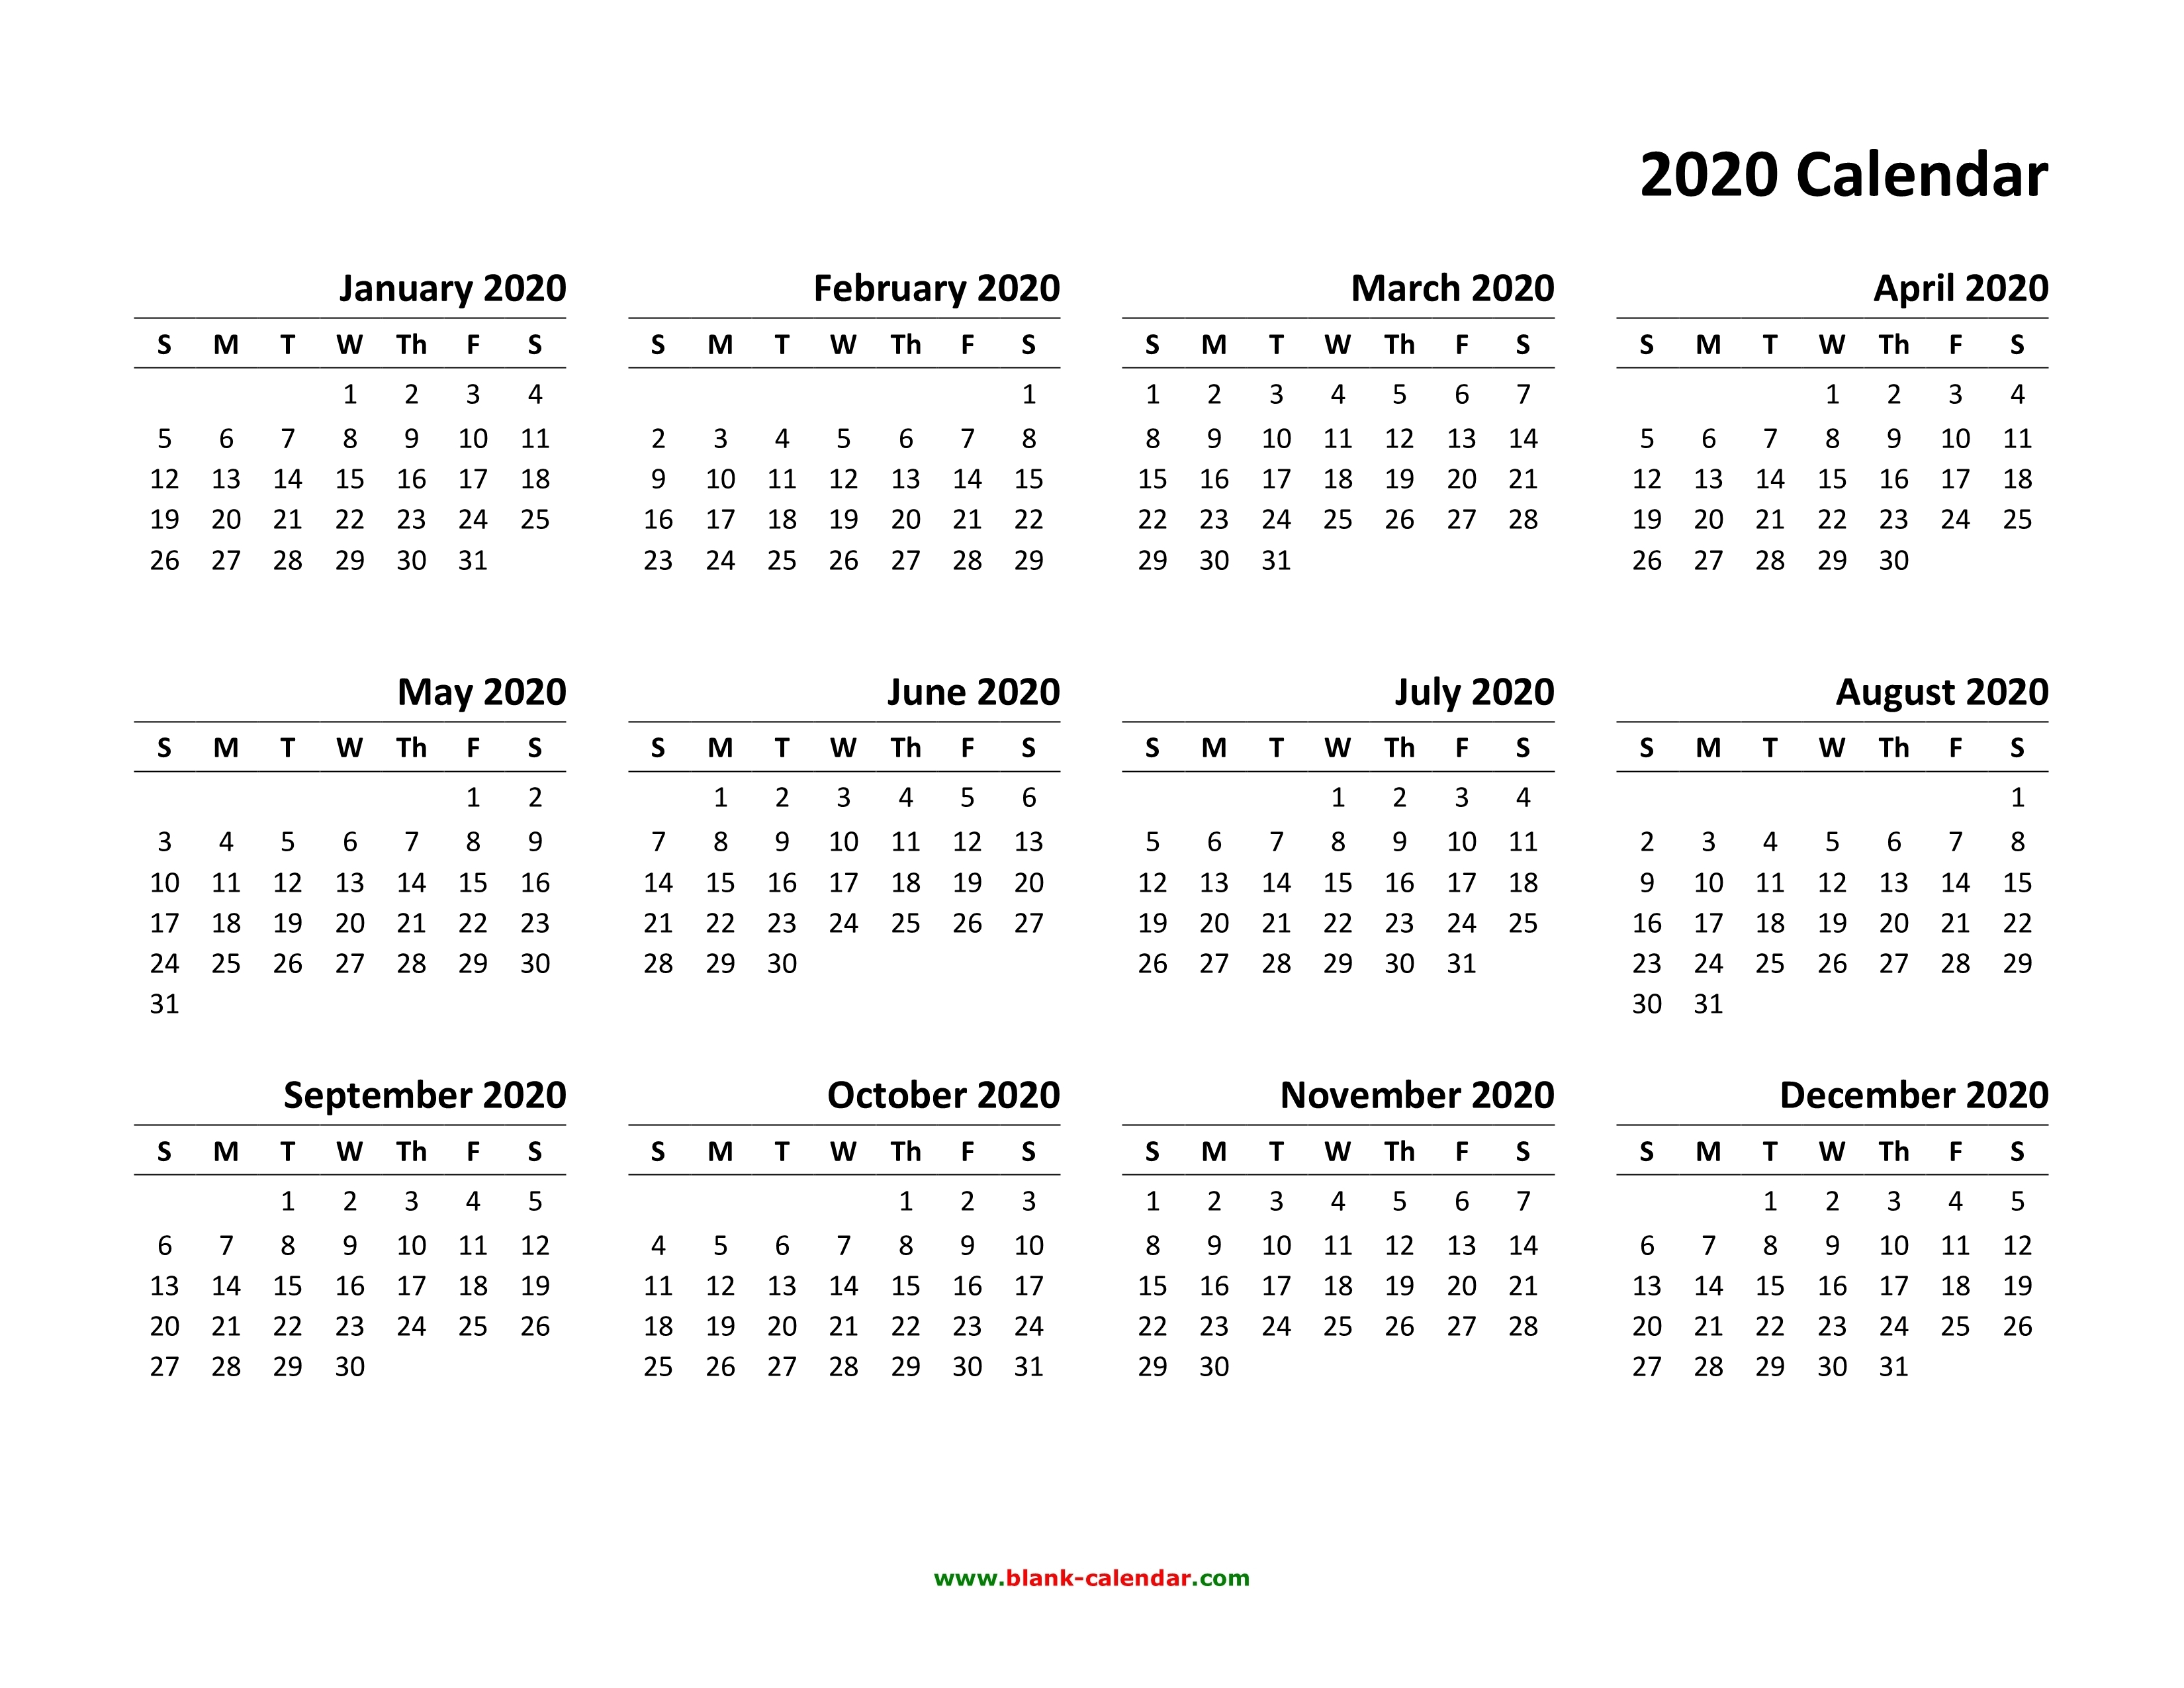 Year 2020 Calendar Singapore | Igotlockedout